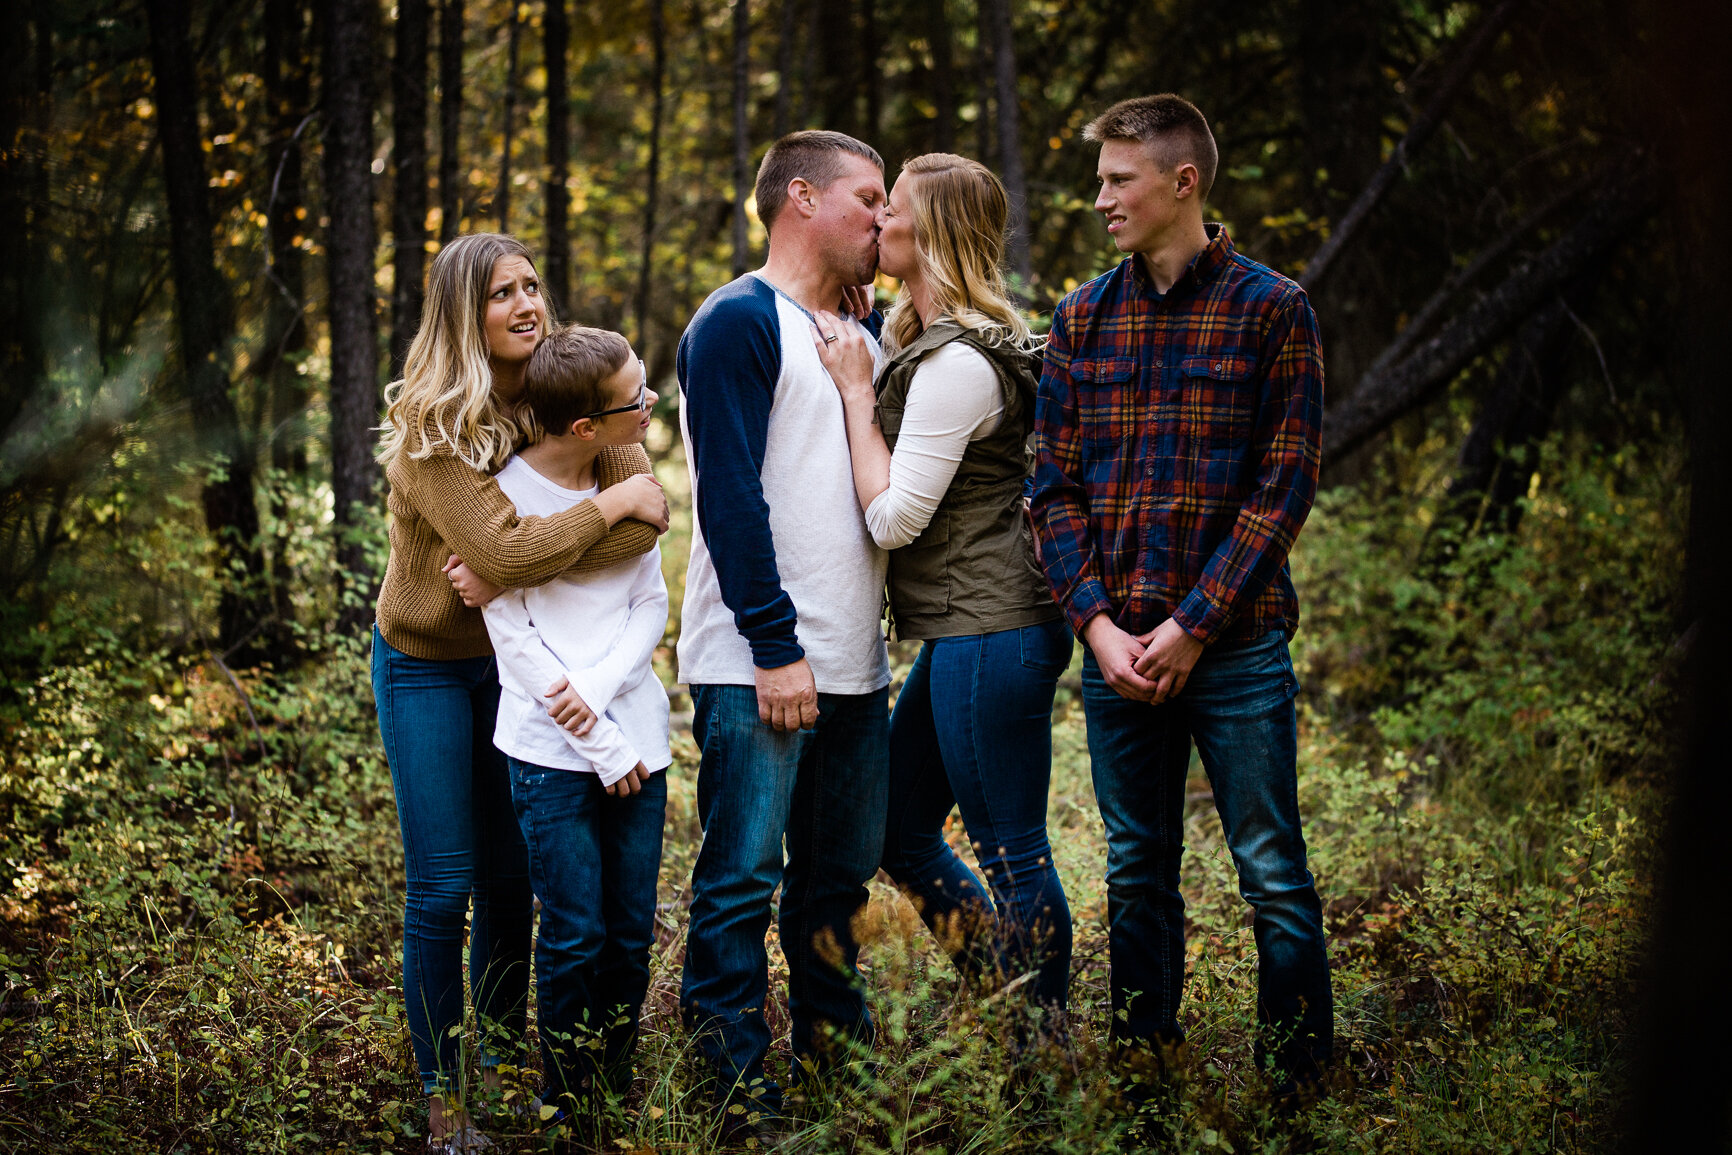 Idaho Family Portrait Photographer